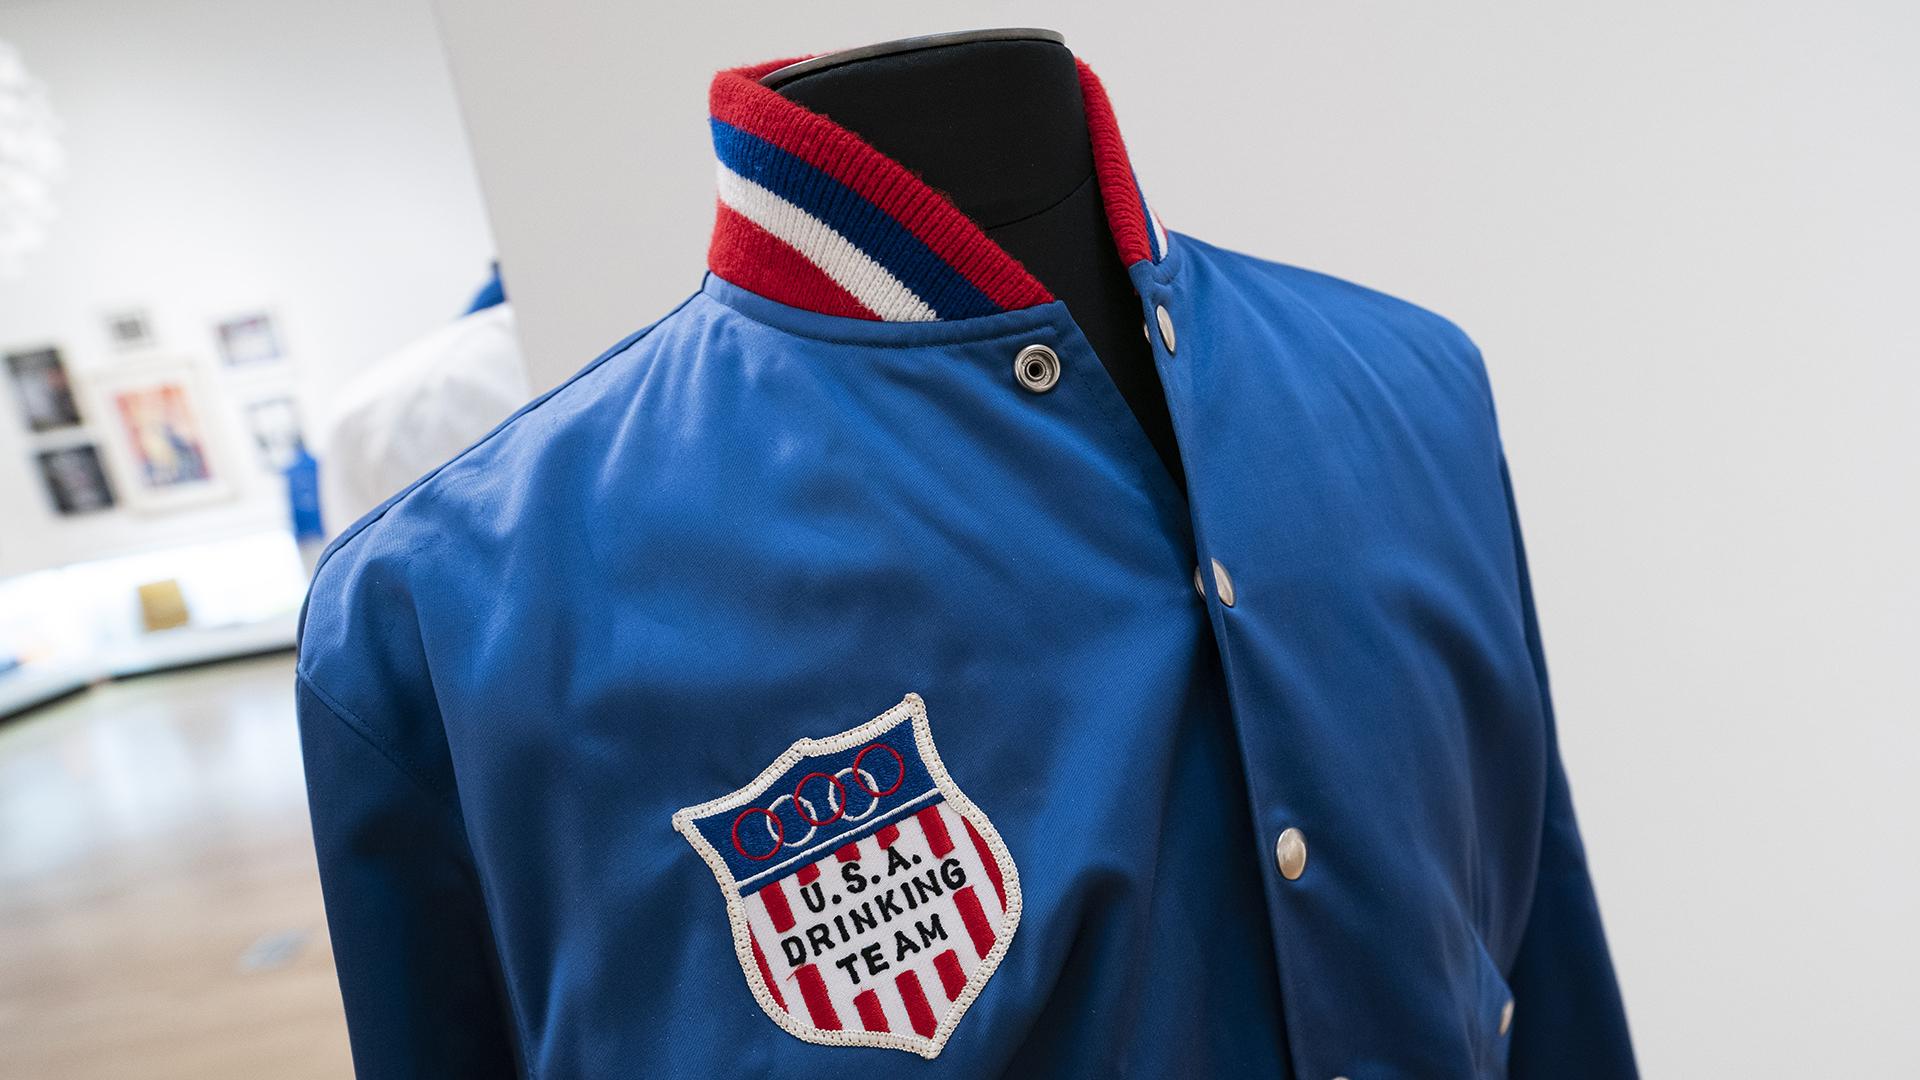 La chaqueta de Frank Sinatra USA Drinking Team (Foto de Don EMMERT / AFP)